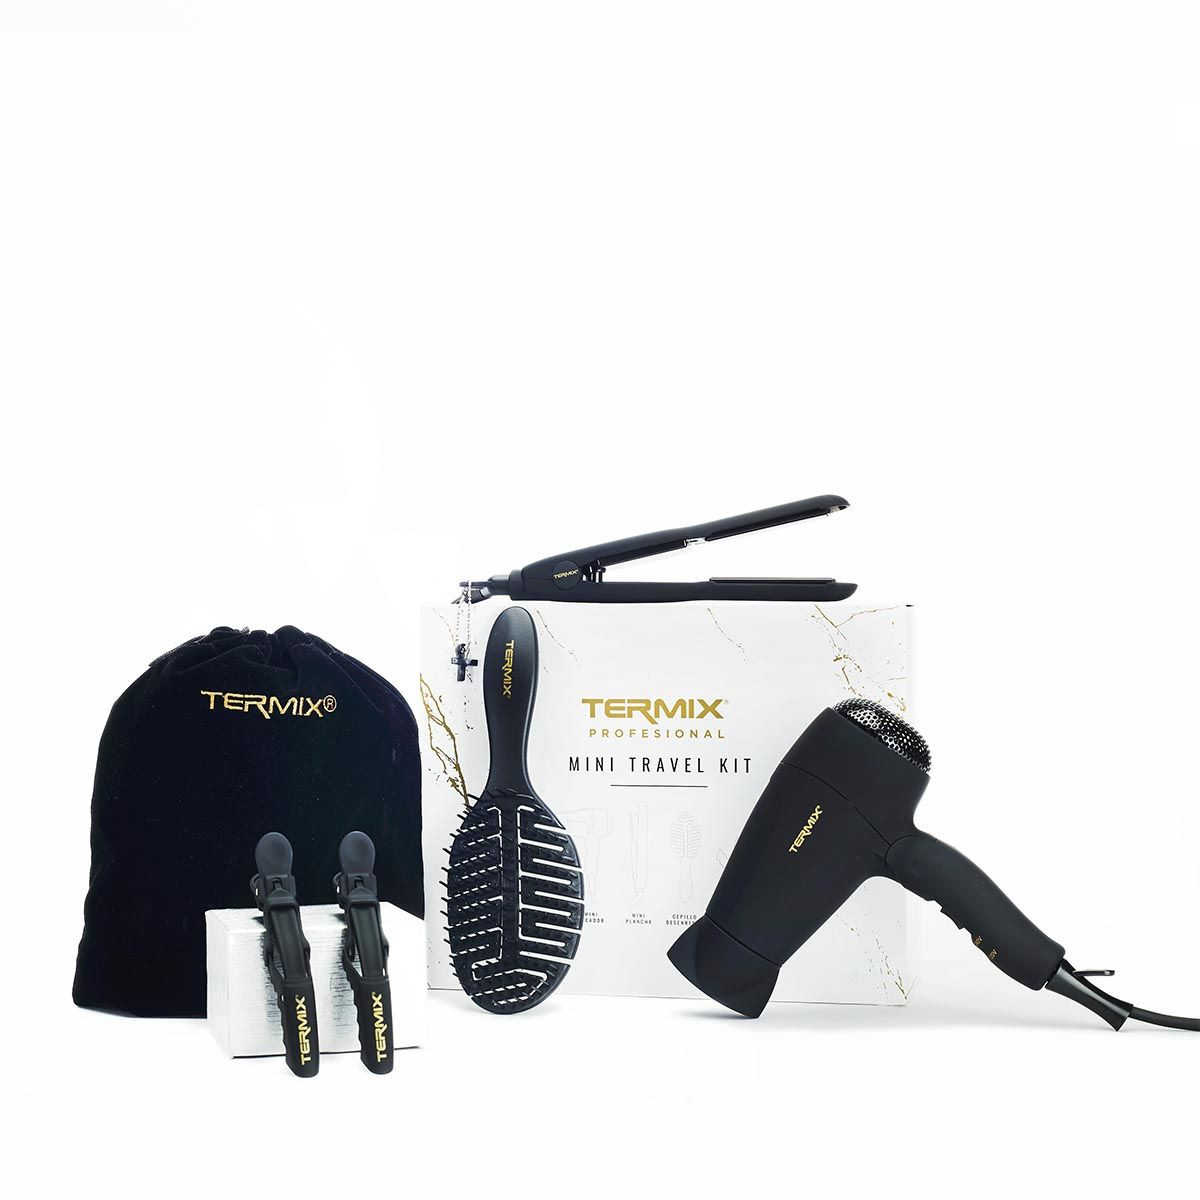 Kit de viaje profesional de peluquería de Termix